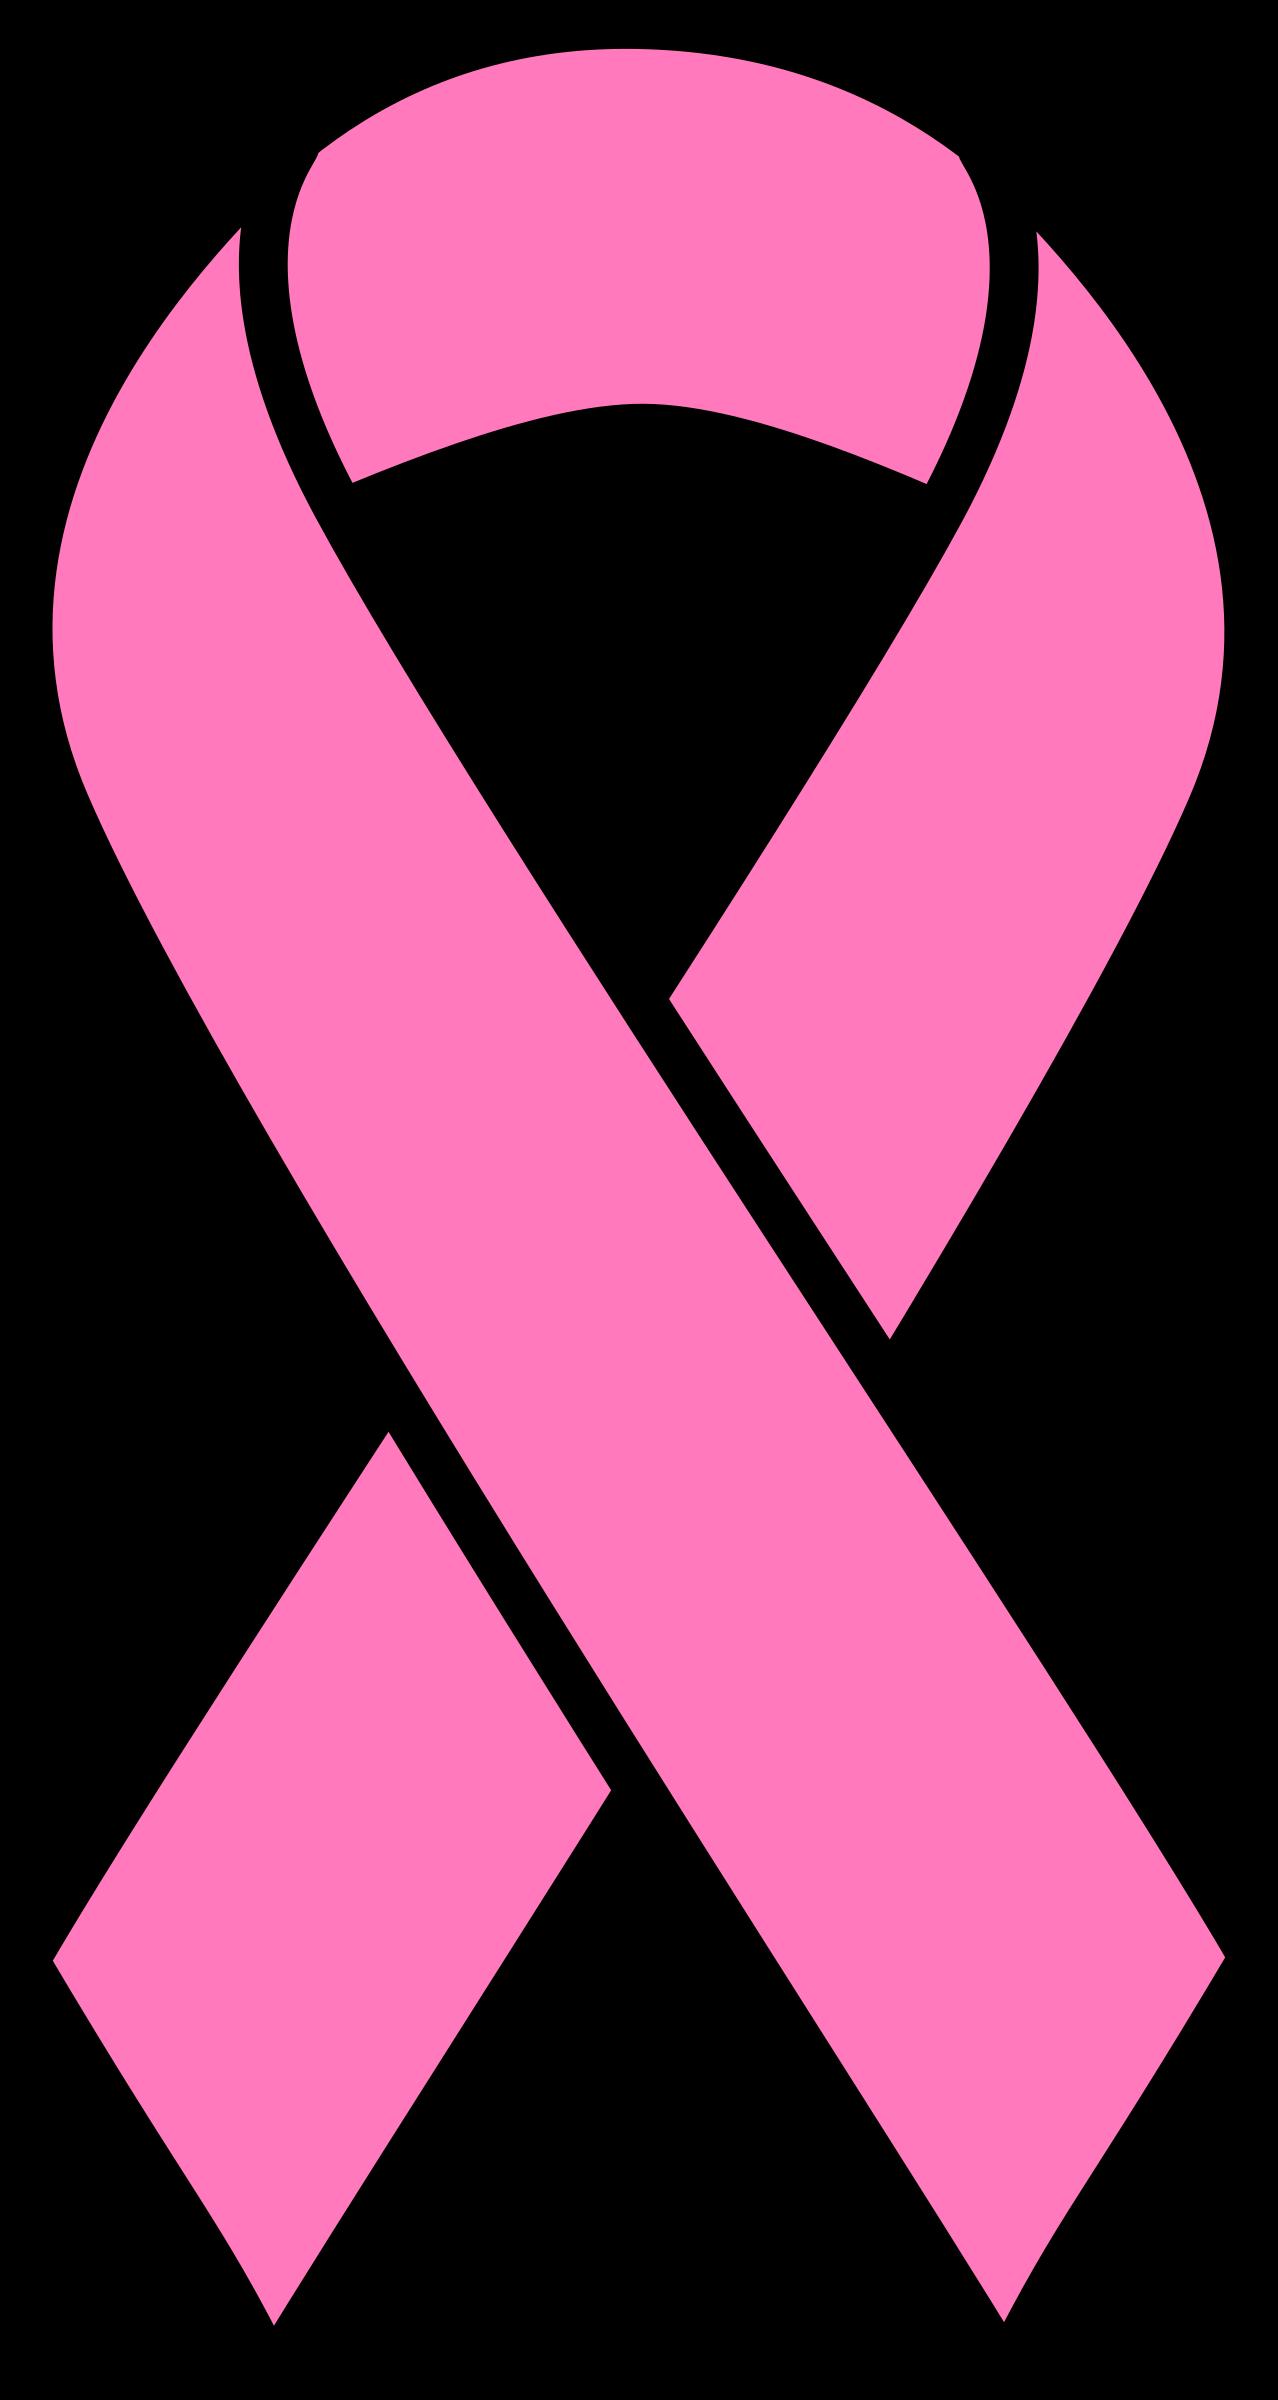 ... Printable Breast Cancer Ribbon Clipa-... Printable breast cancer ribbon clipart 2 clipartall - Cliparting clipartall.com ...-15